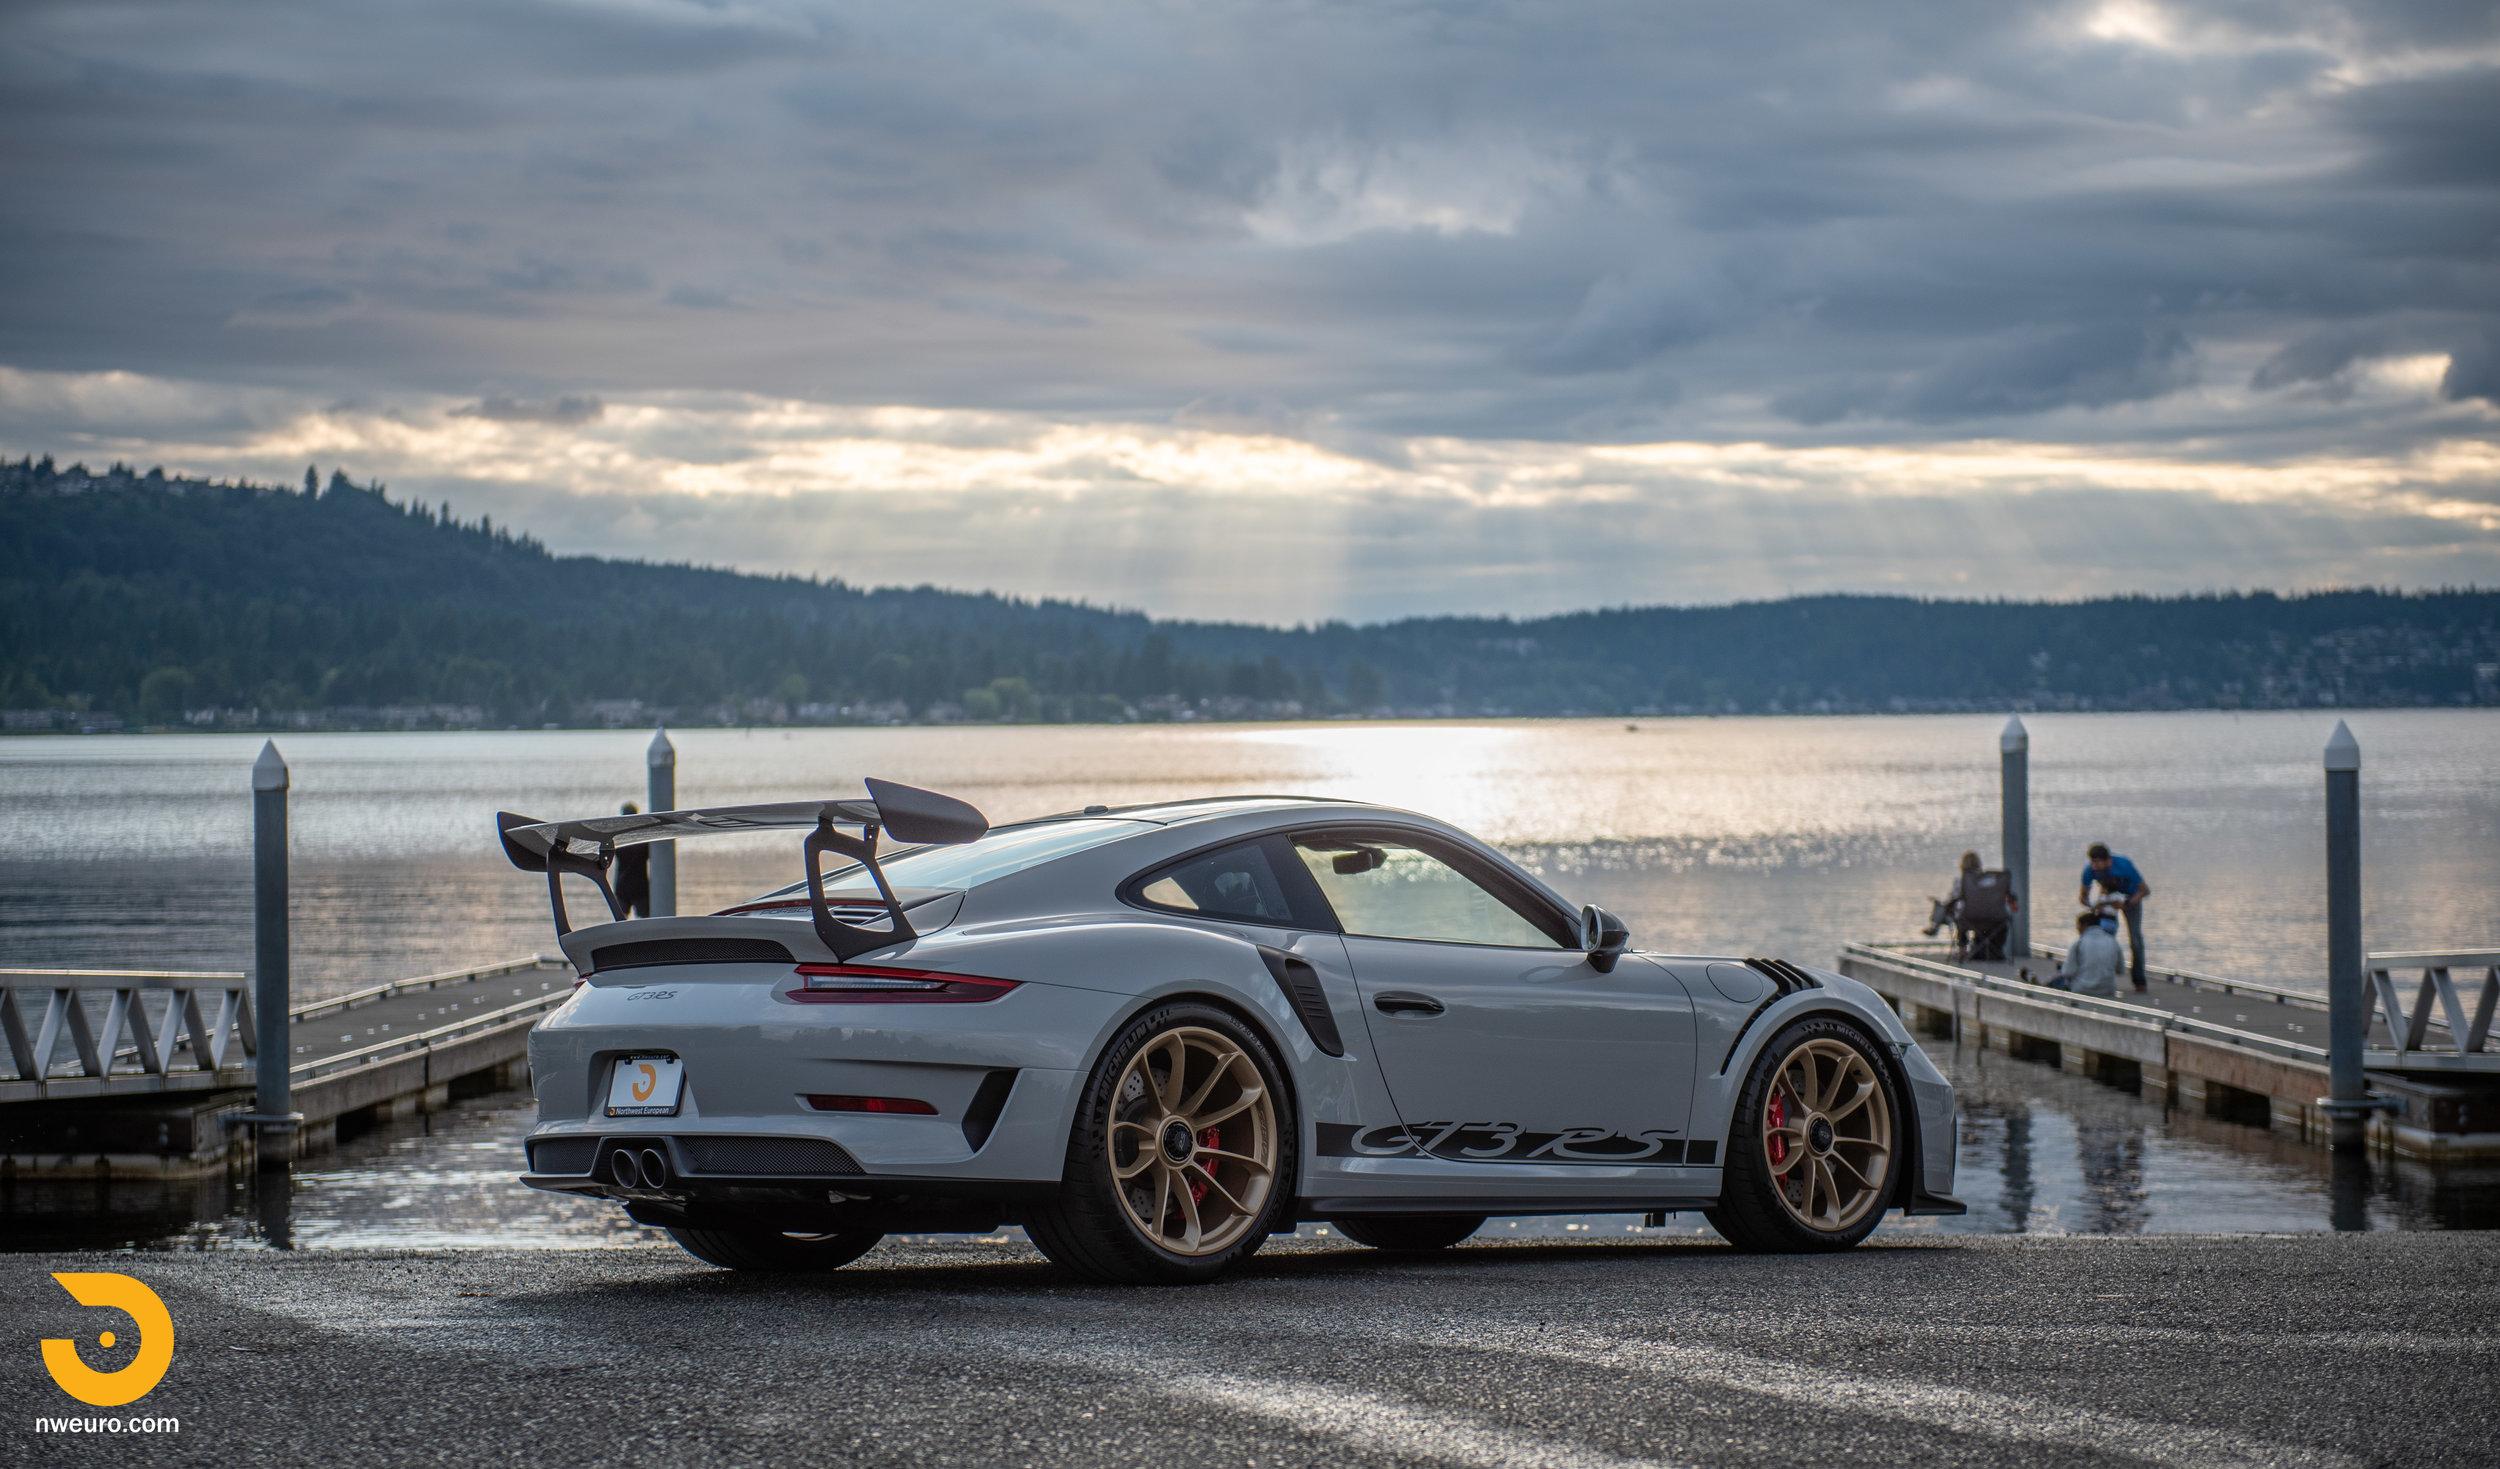 2019 Porsche GT3 RS - Chalk-78.jpg